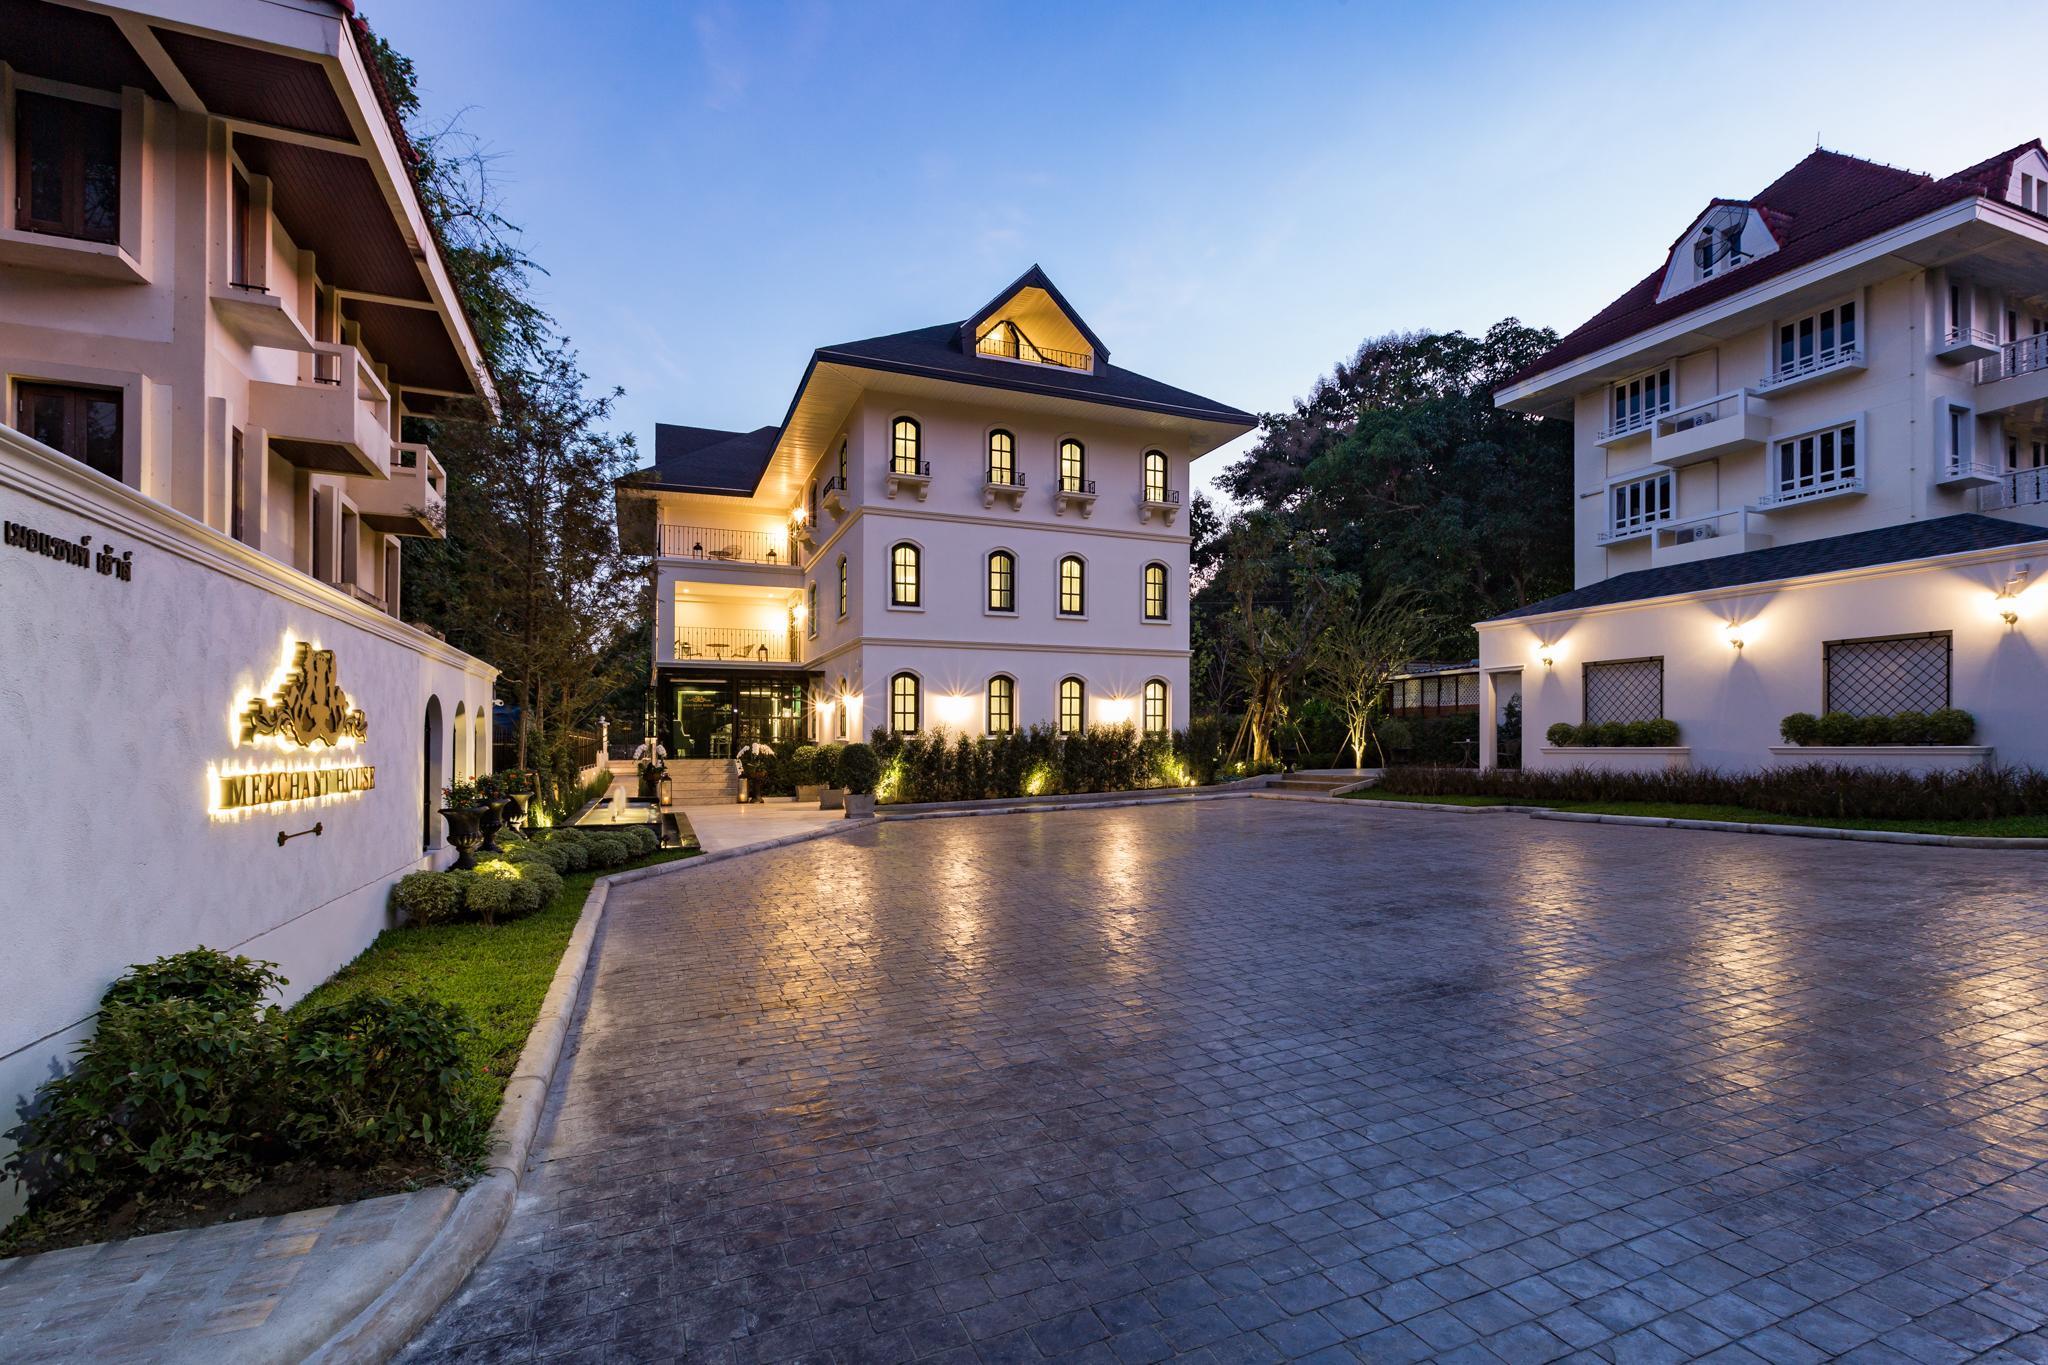 The Merchant House Chiangmai เดอะ เมอร์แชนต์ เฮาส์ เชียงใหม่